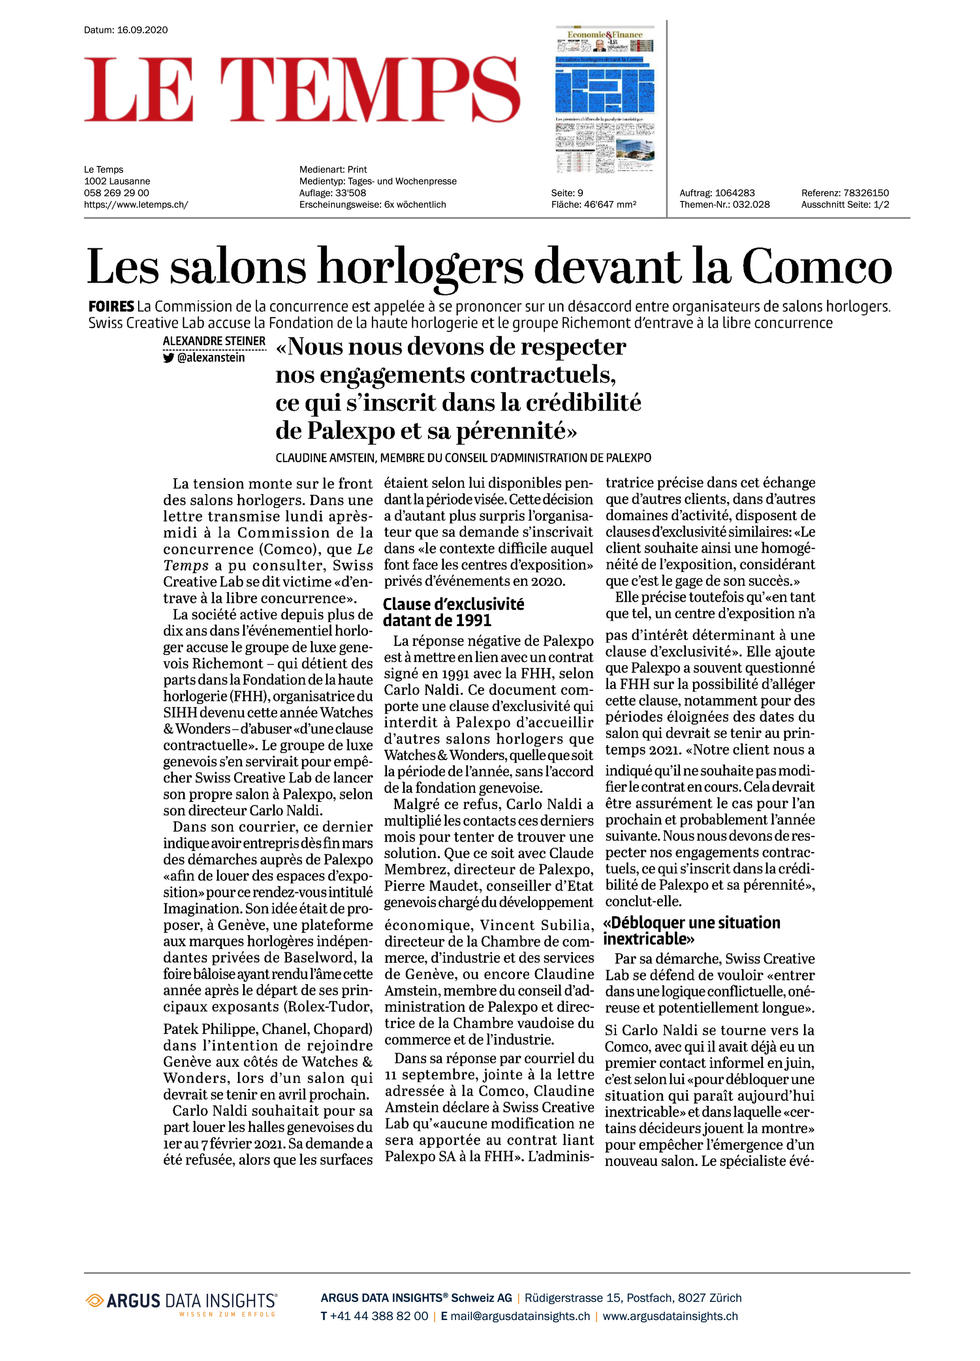 LE TEMPS, 16.09.2020 COMCO - copie.jpg